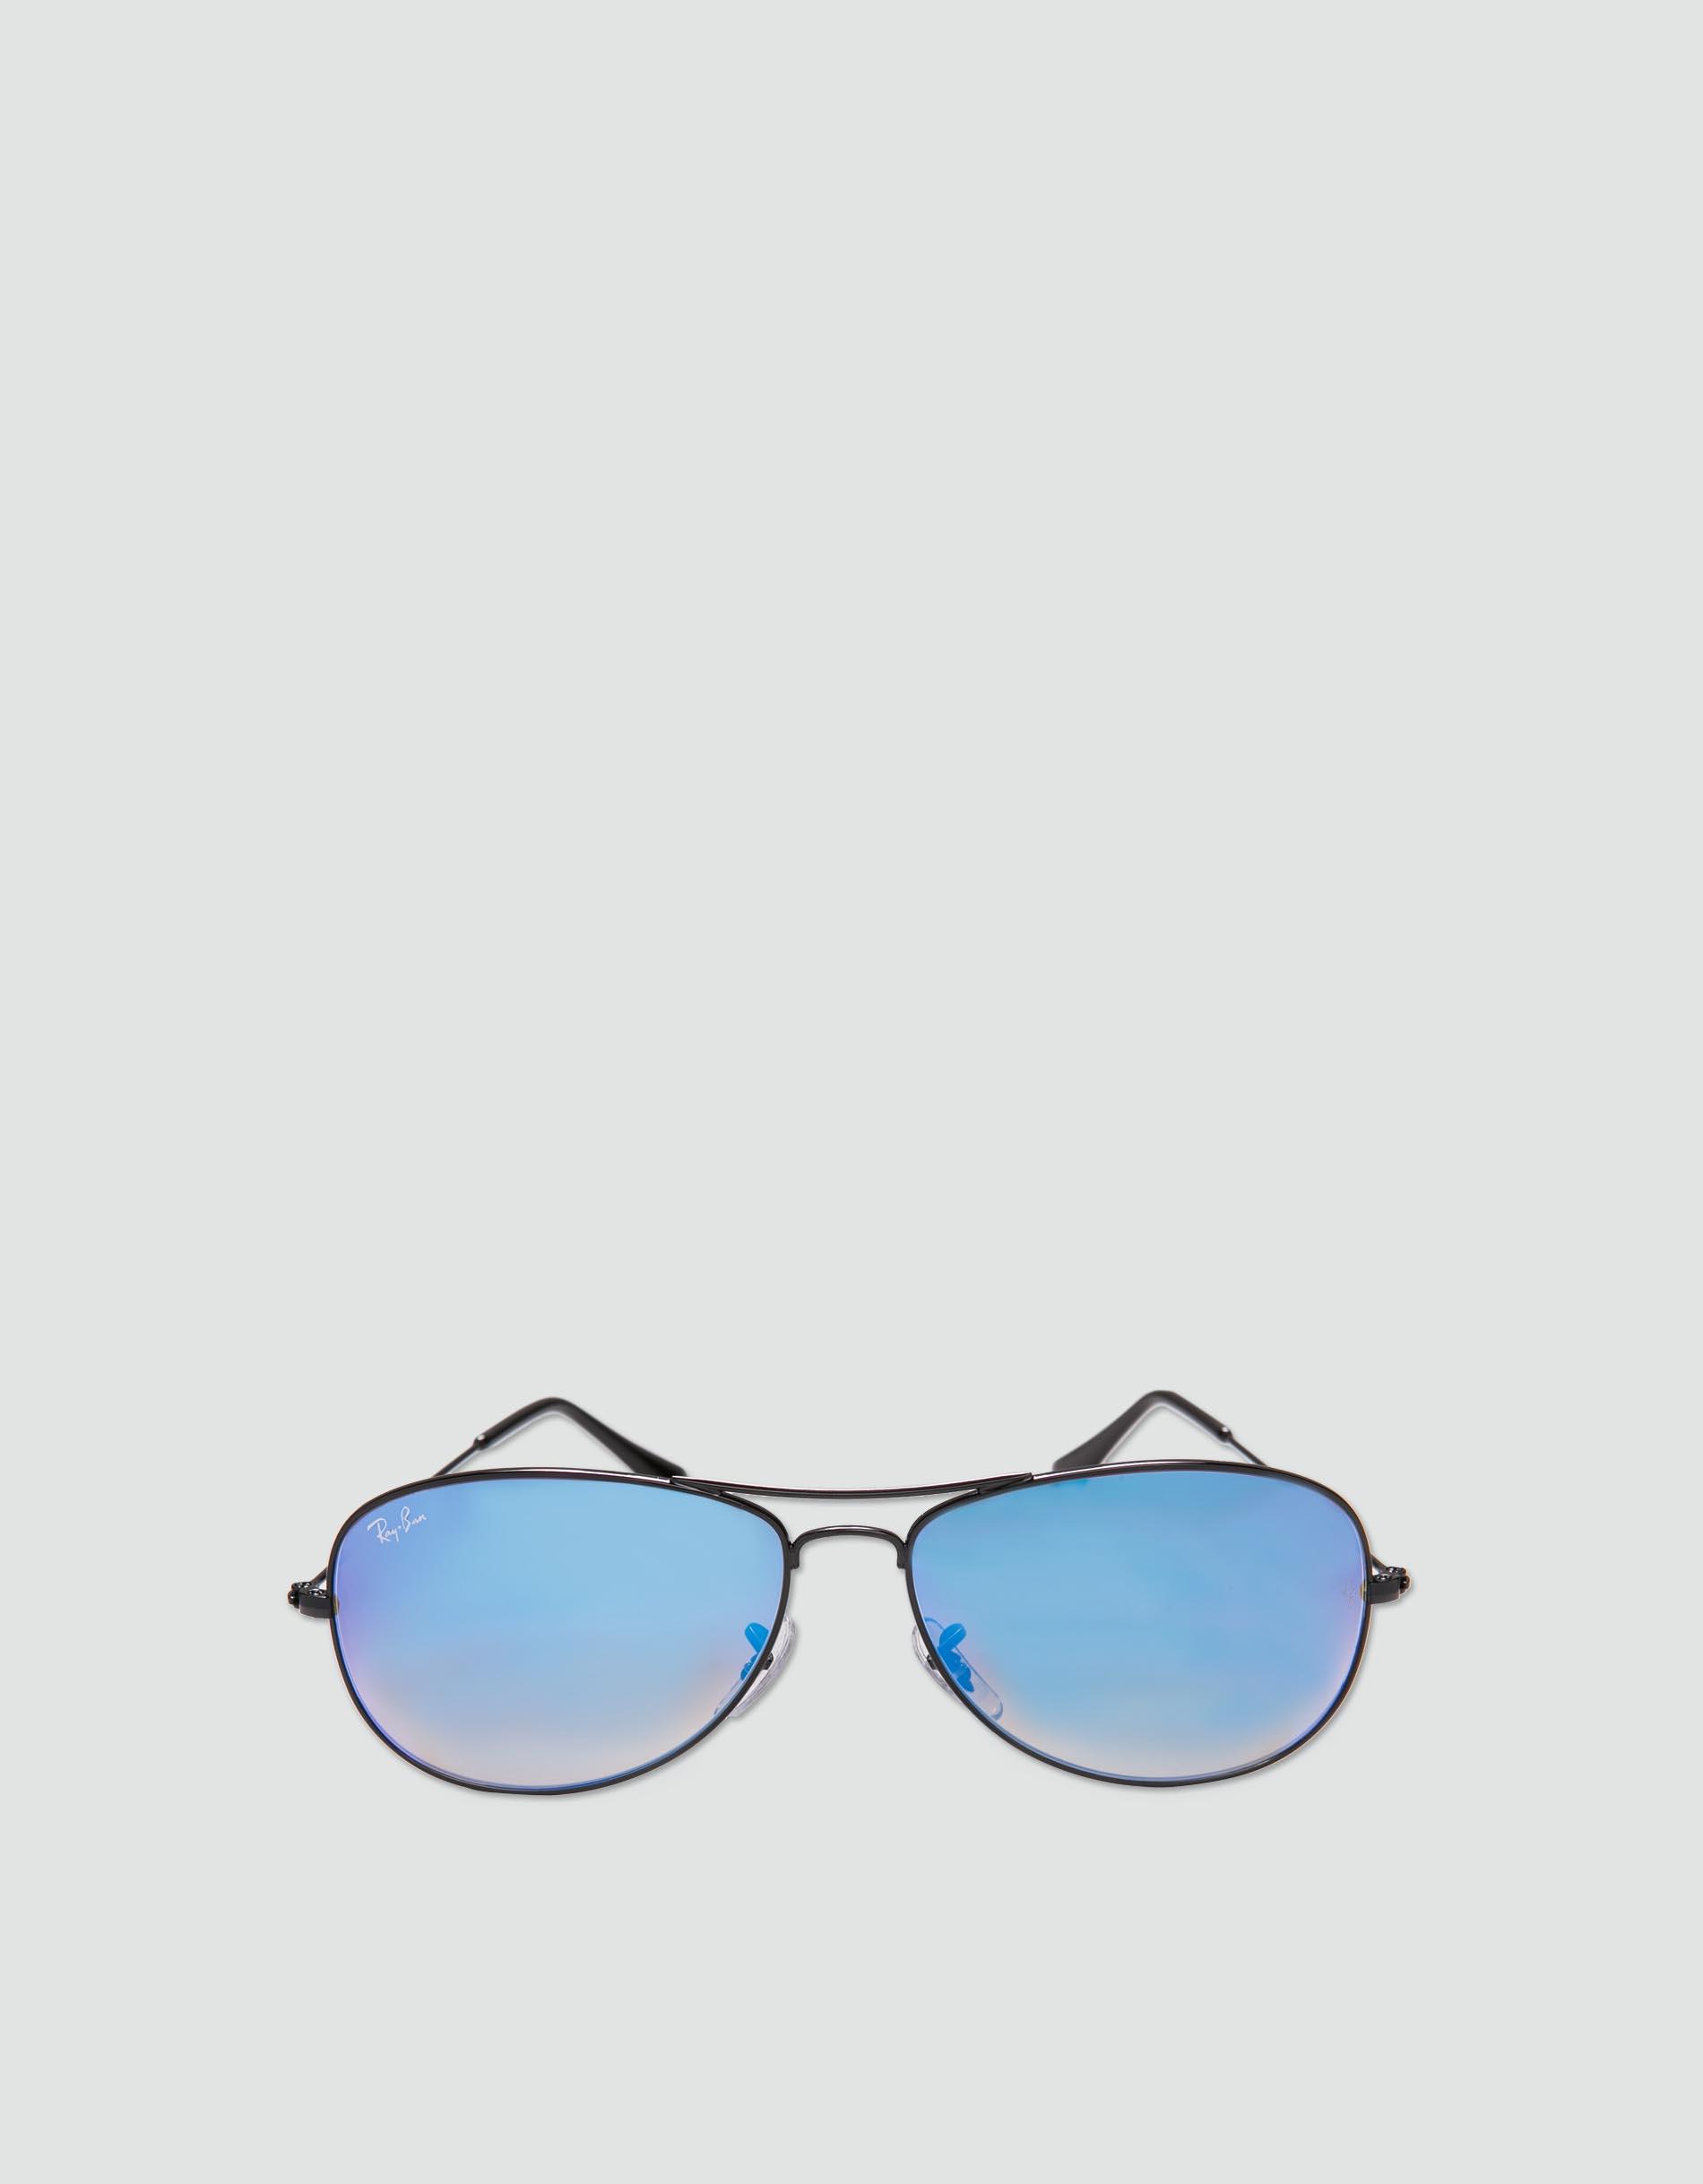 ray ban brille sonnen aviator